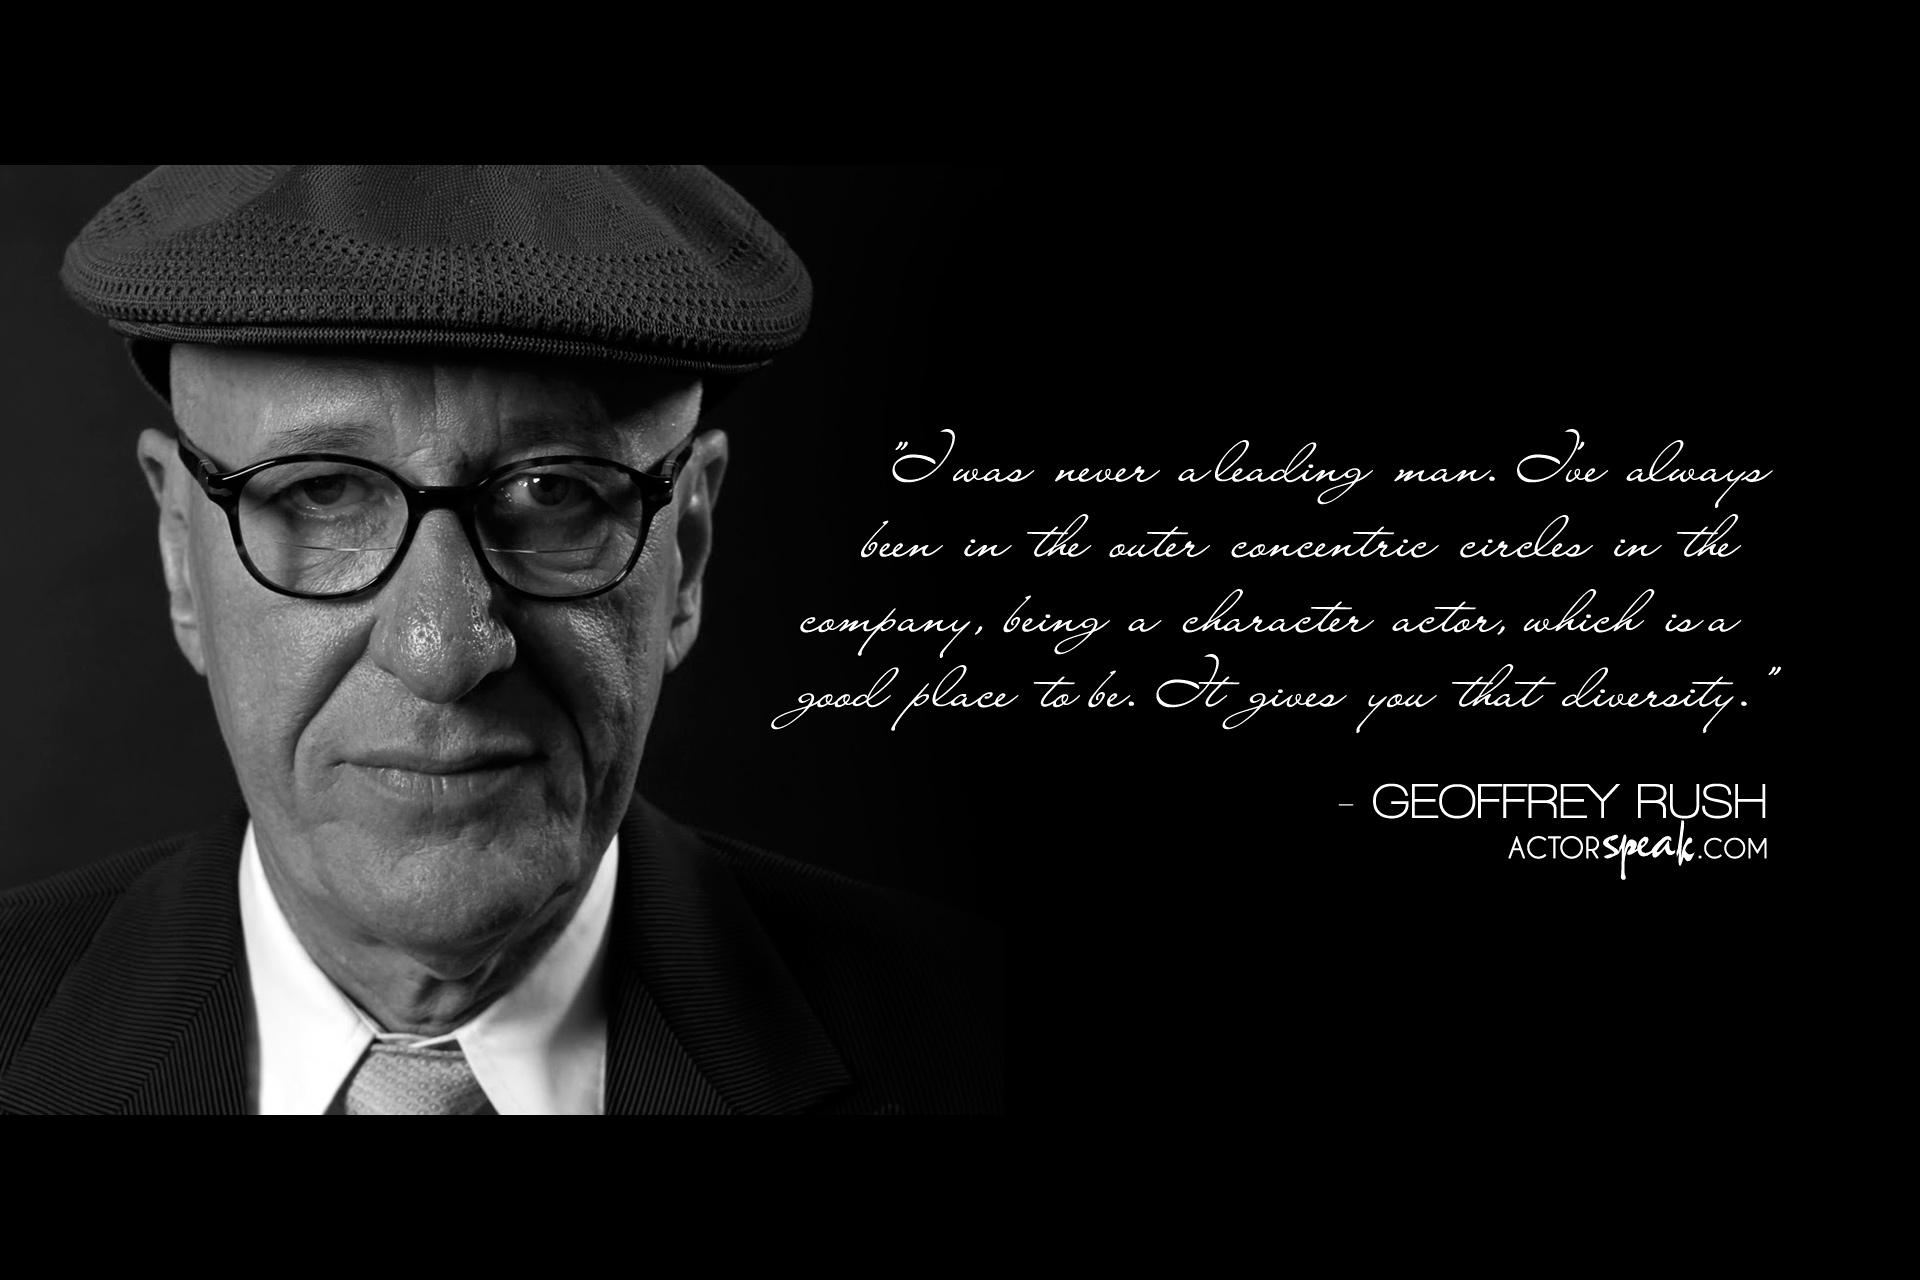 Geoffrey Rush's quote #1